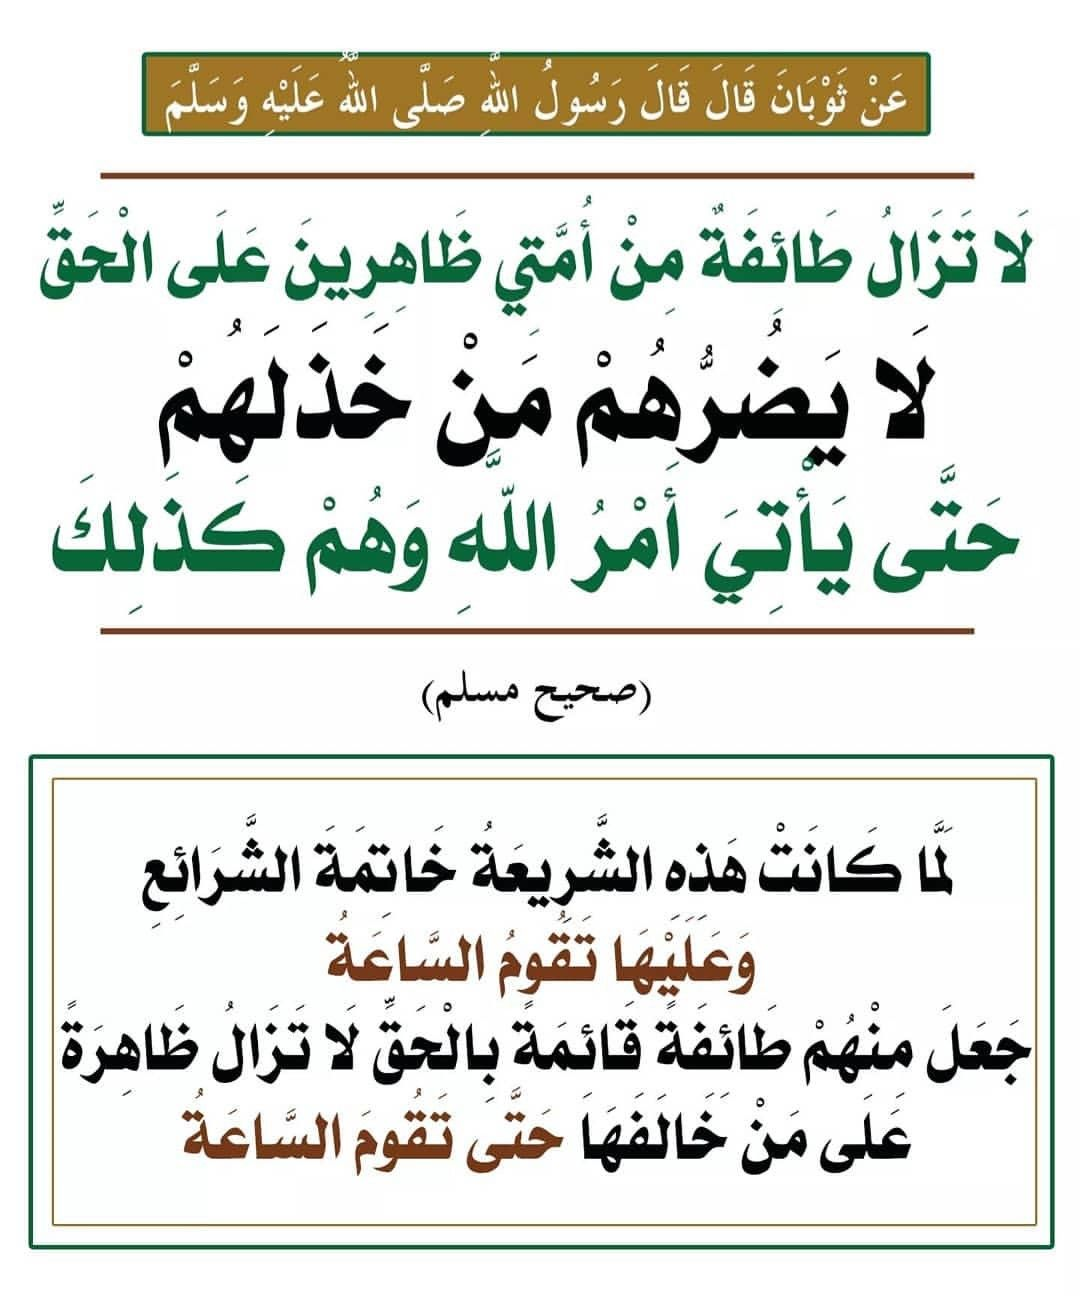 Pin By عبق الورد On أحاديث نبوية١ Arabic Quotes Arabic Typing Hadith